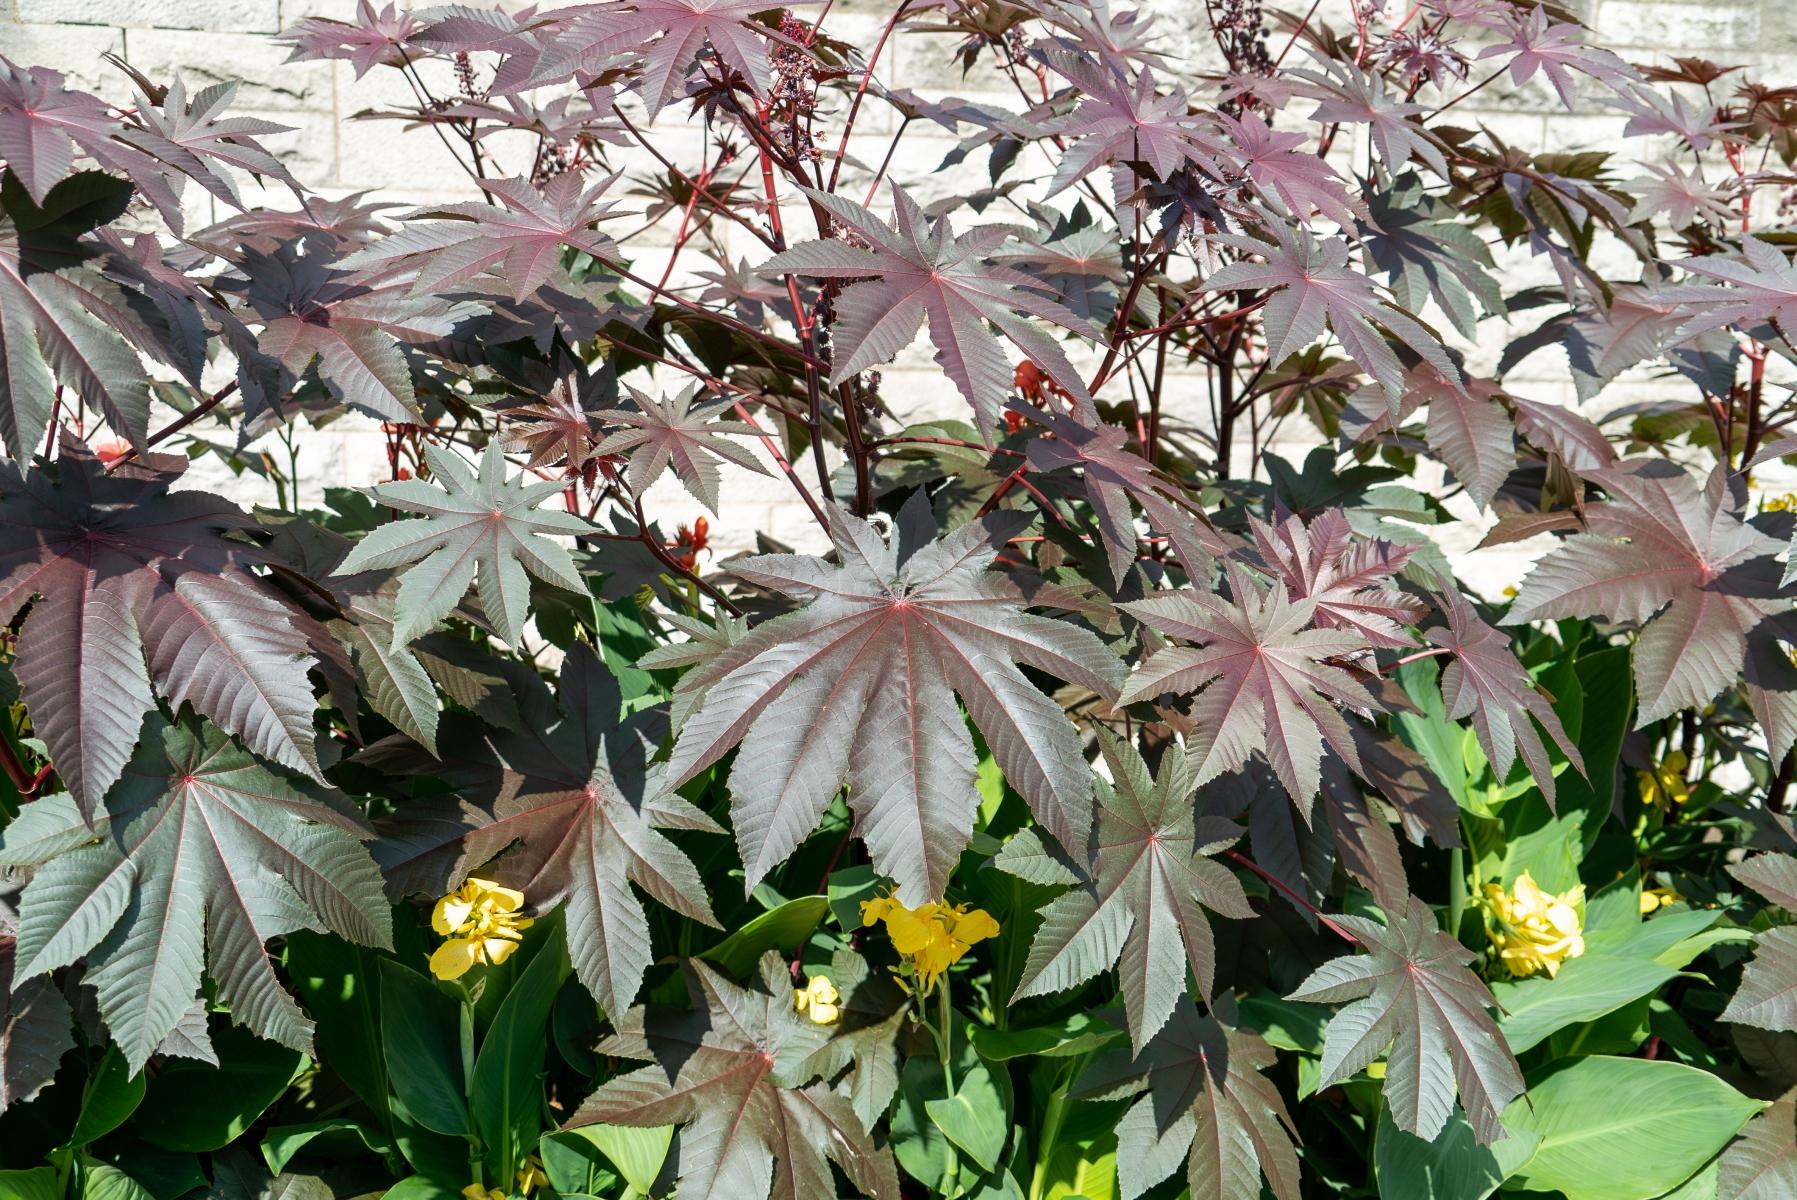 Flora on Niagara patio